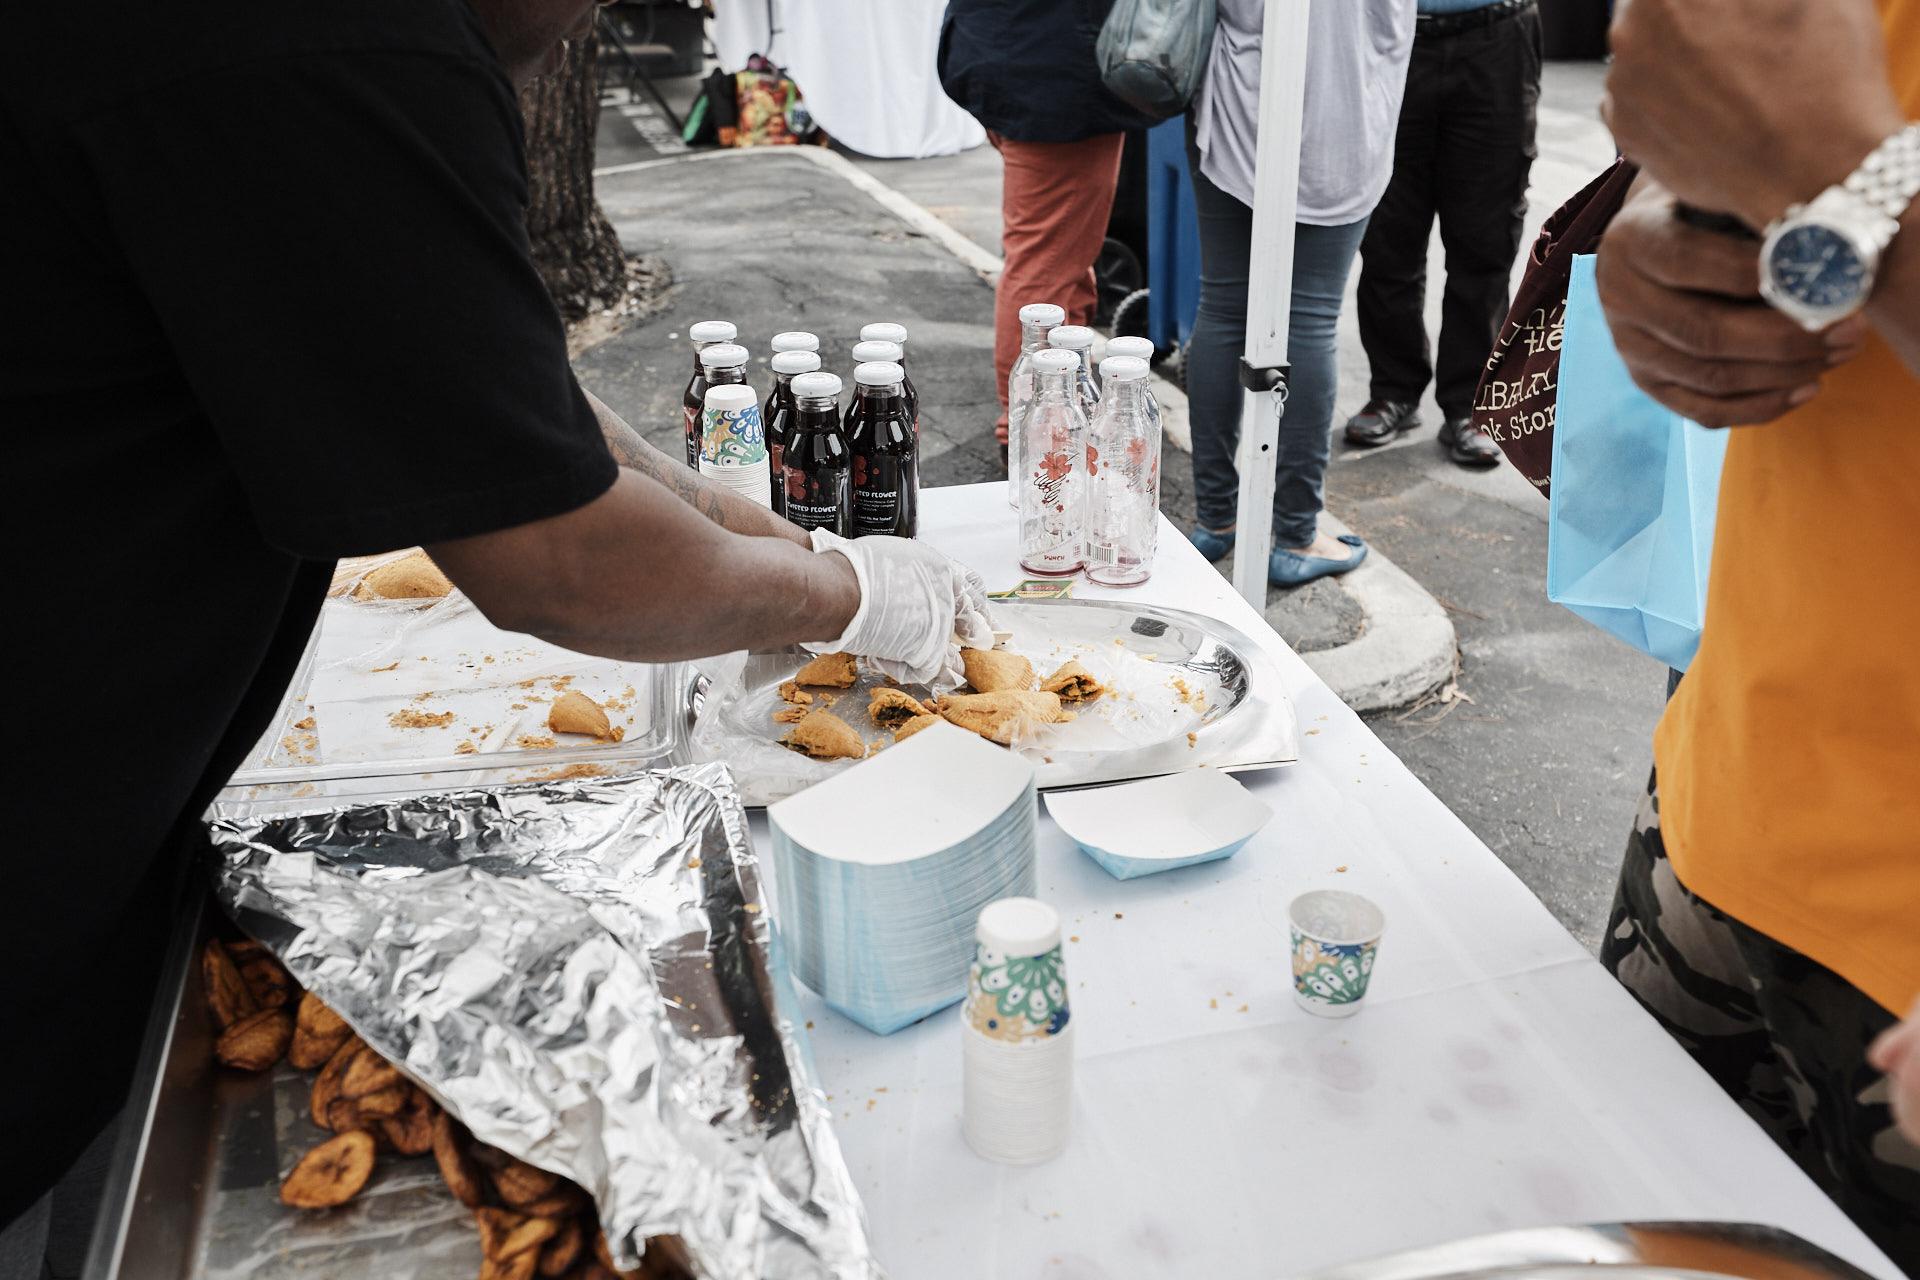 2019-earth-day-taste-of-toluca-celebration-22